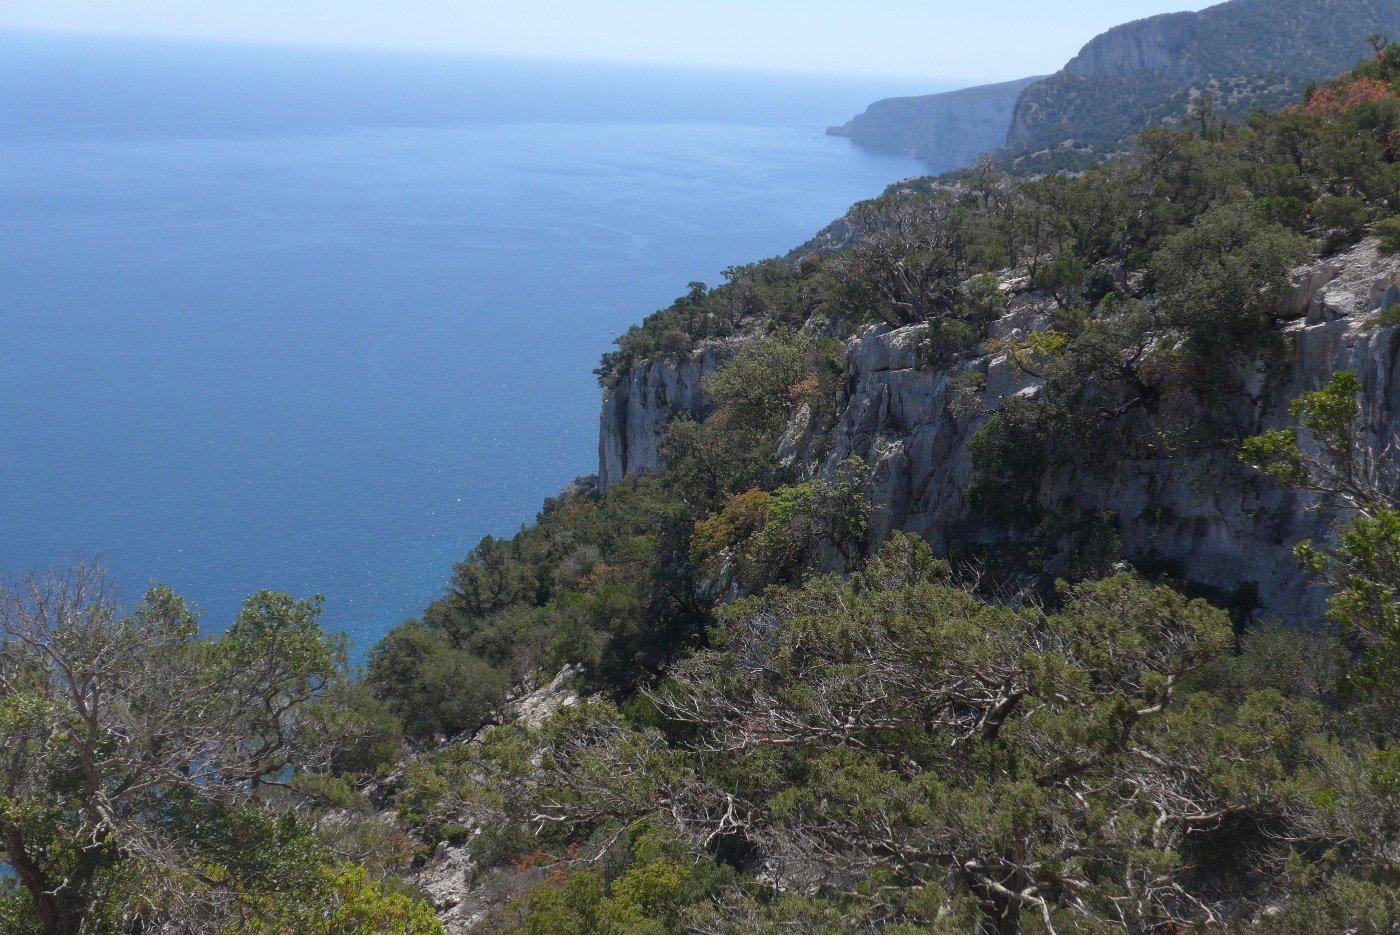 Panorama verso sud dall'ovile Piddi